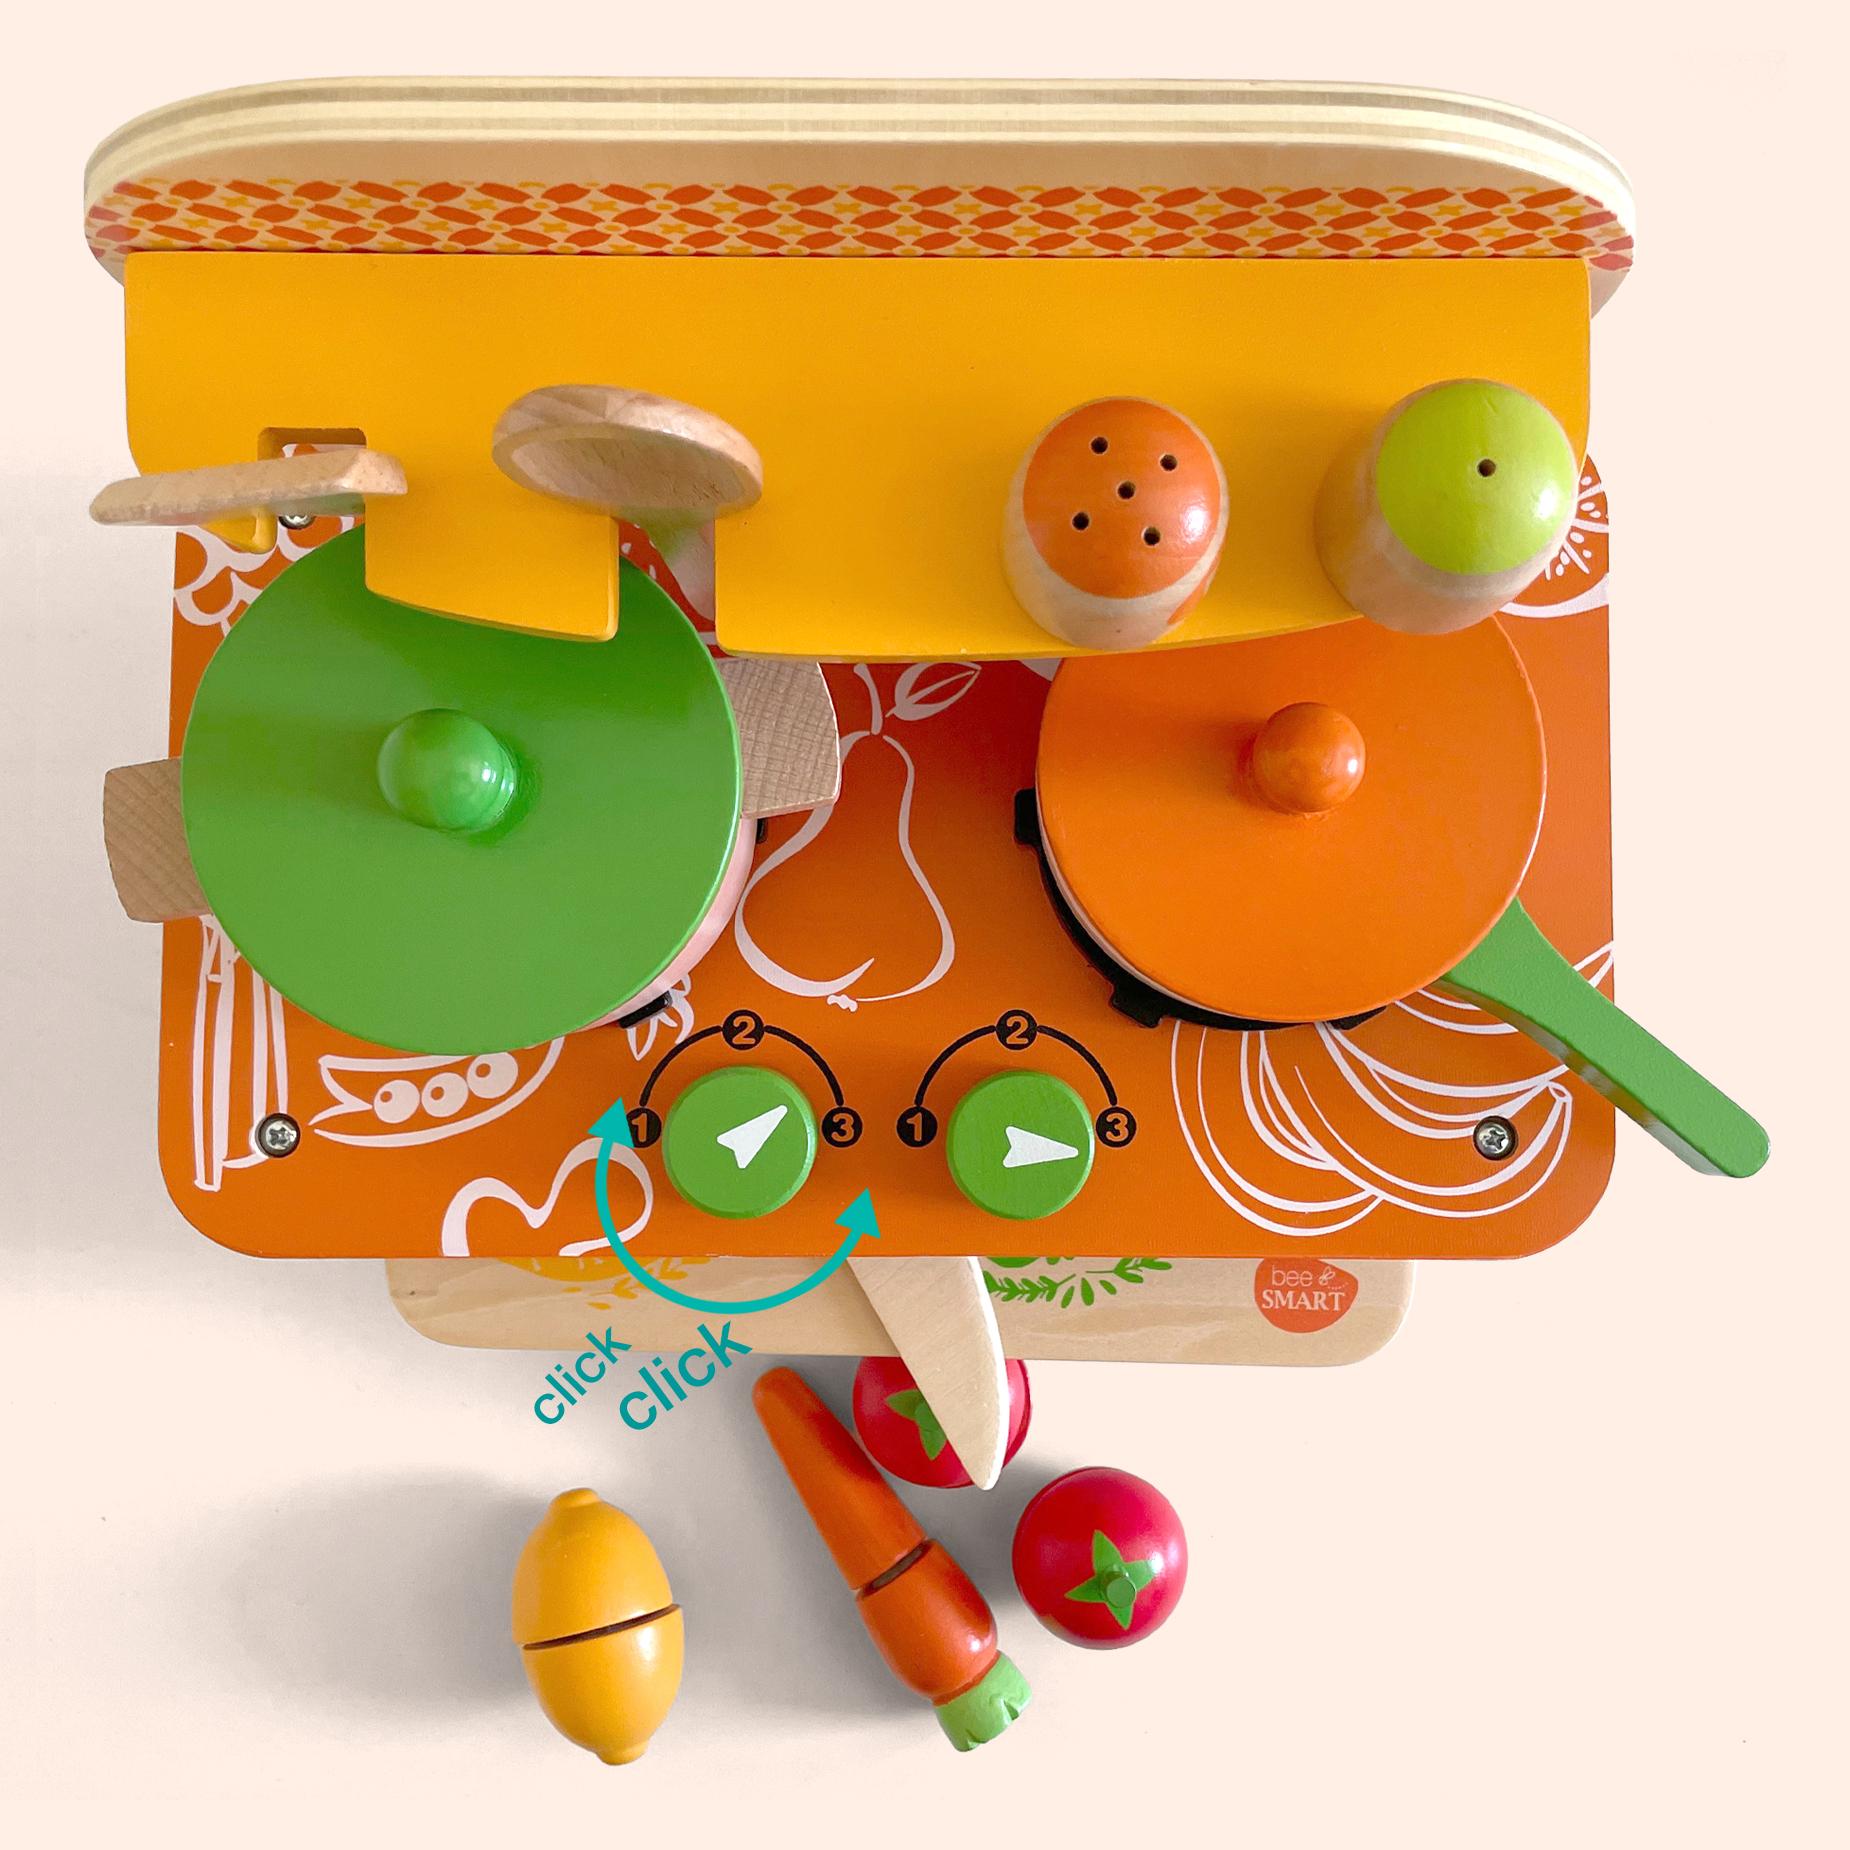 Pretend Play Food Kitchen Set for kids